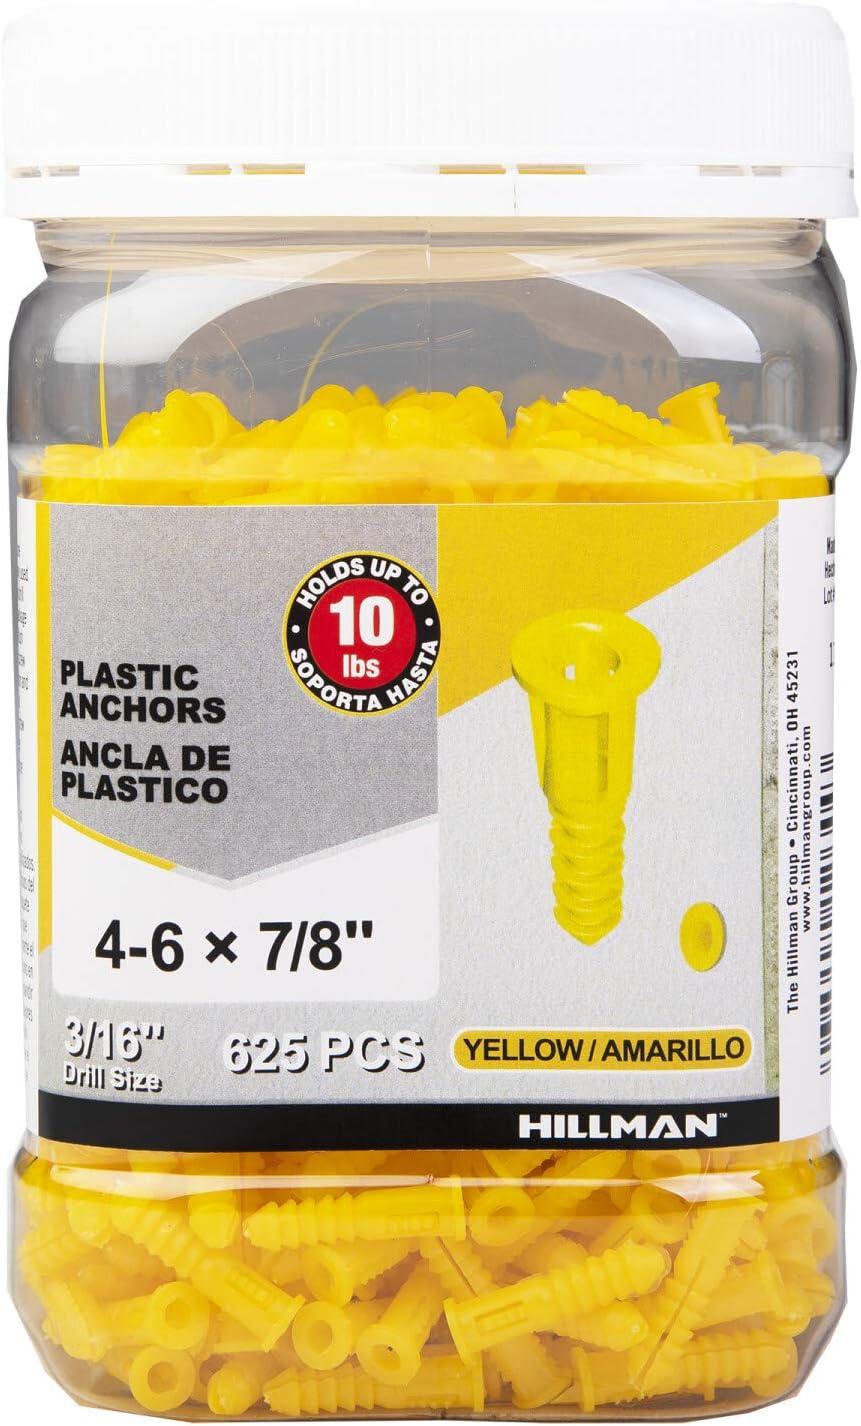 Hillman Plastic Wall Anchors 4-6X7/8In Jar 625Ct - Yellow